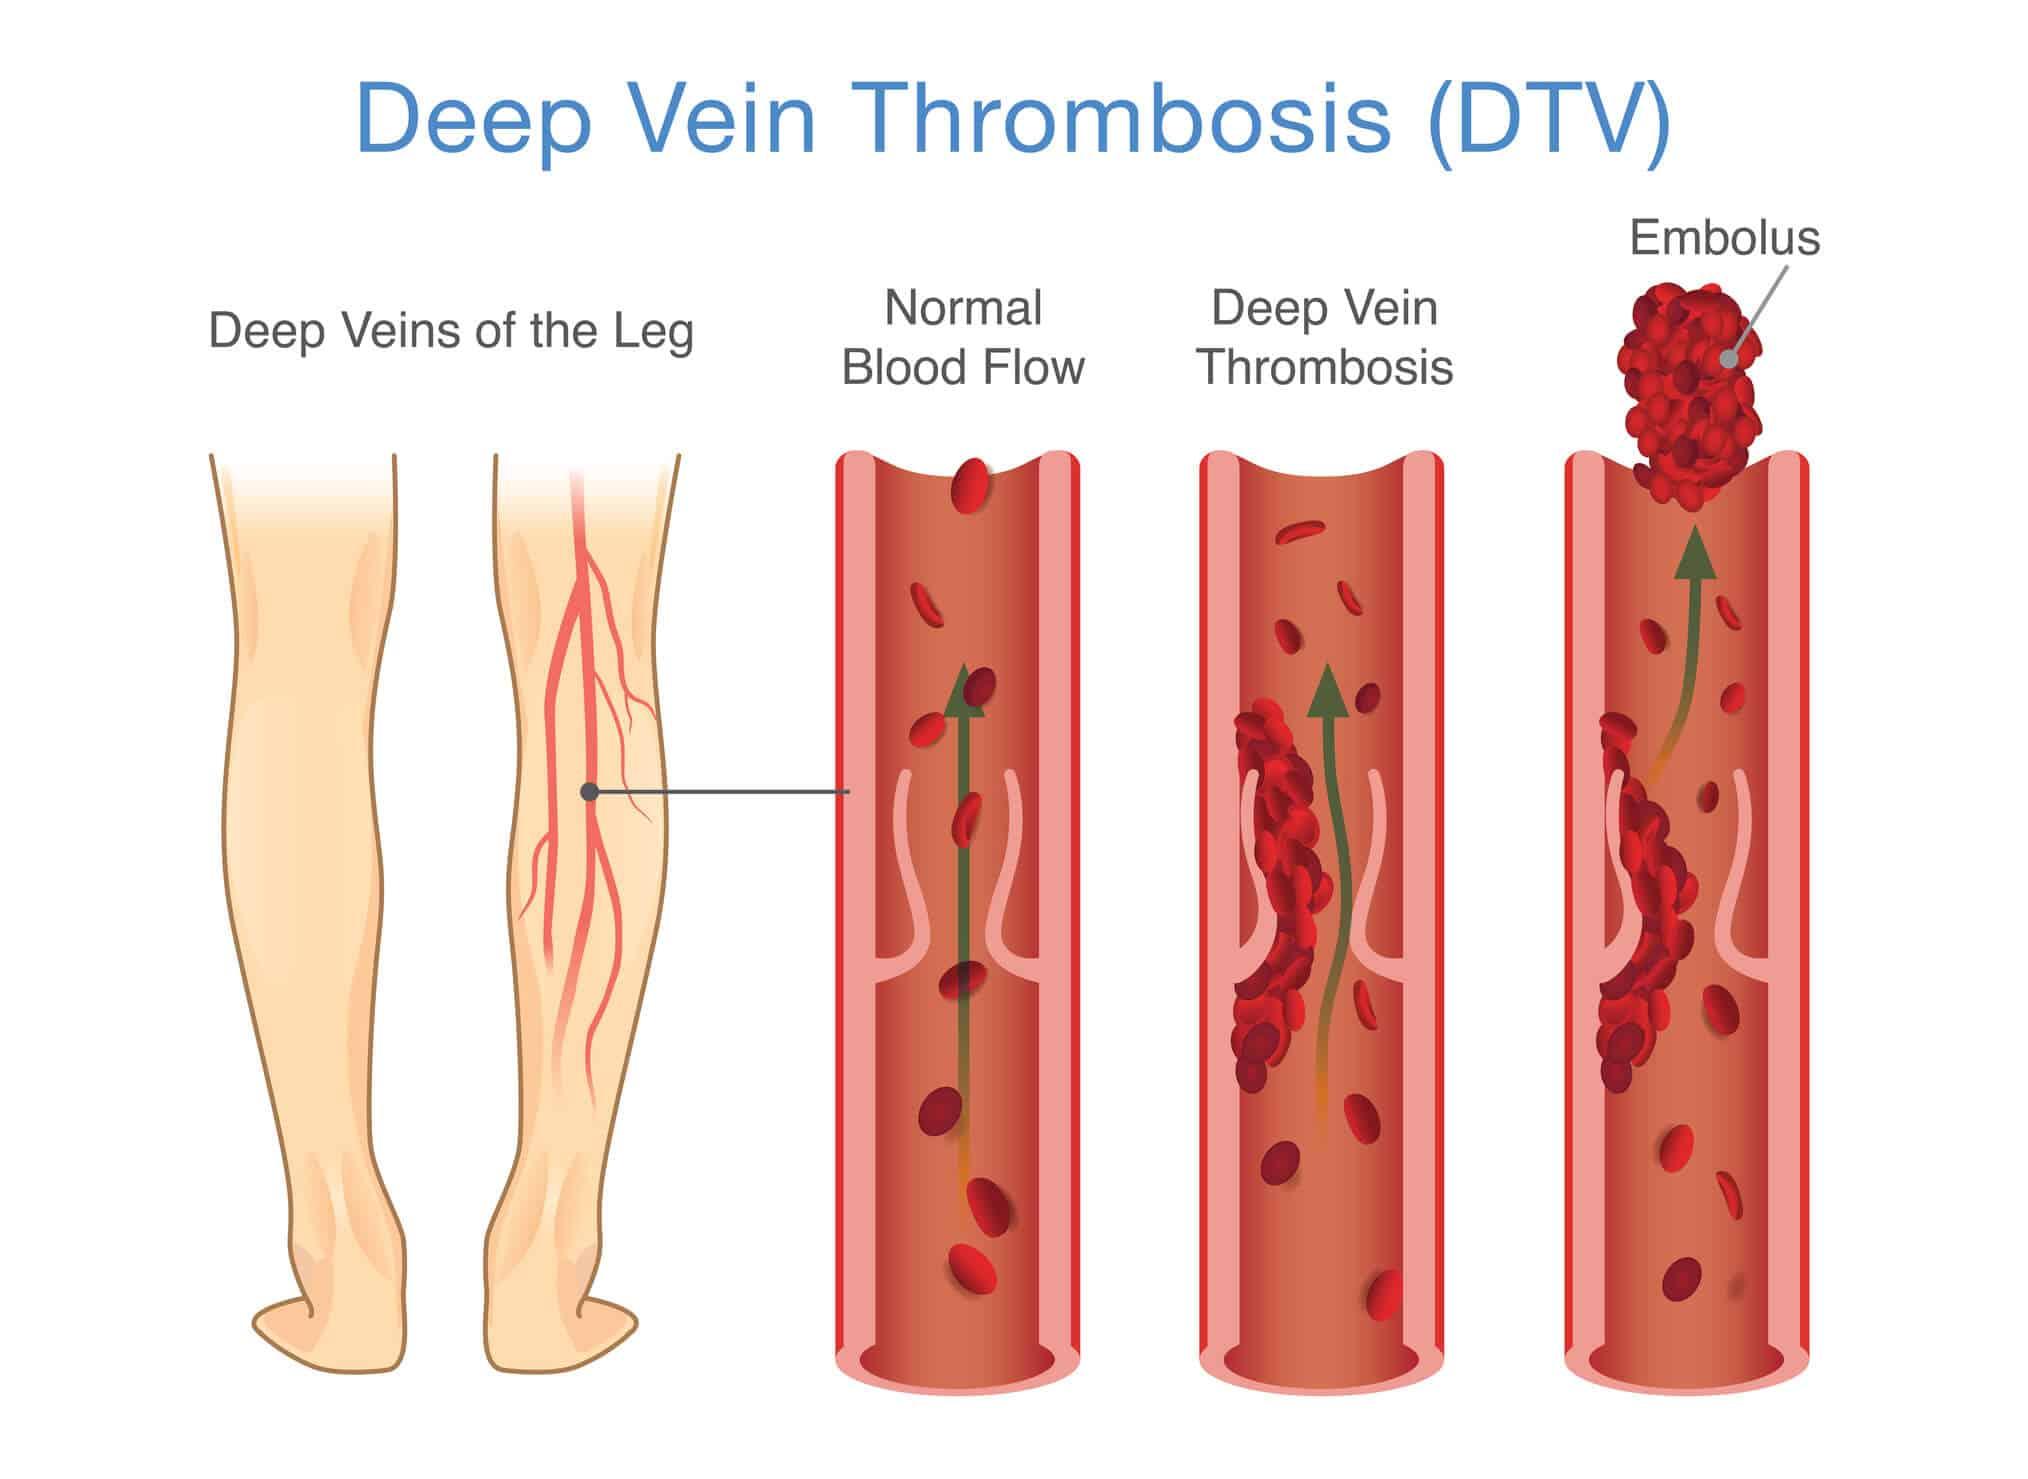 Image of the development of Deep Vein Thrombosis